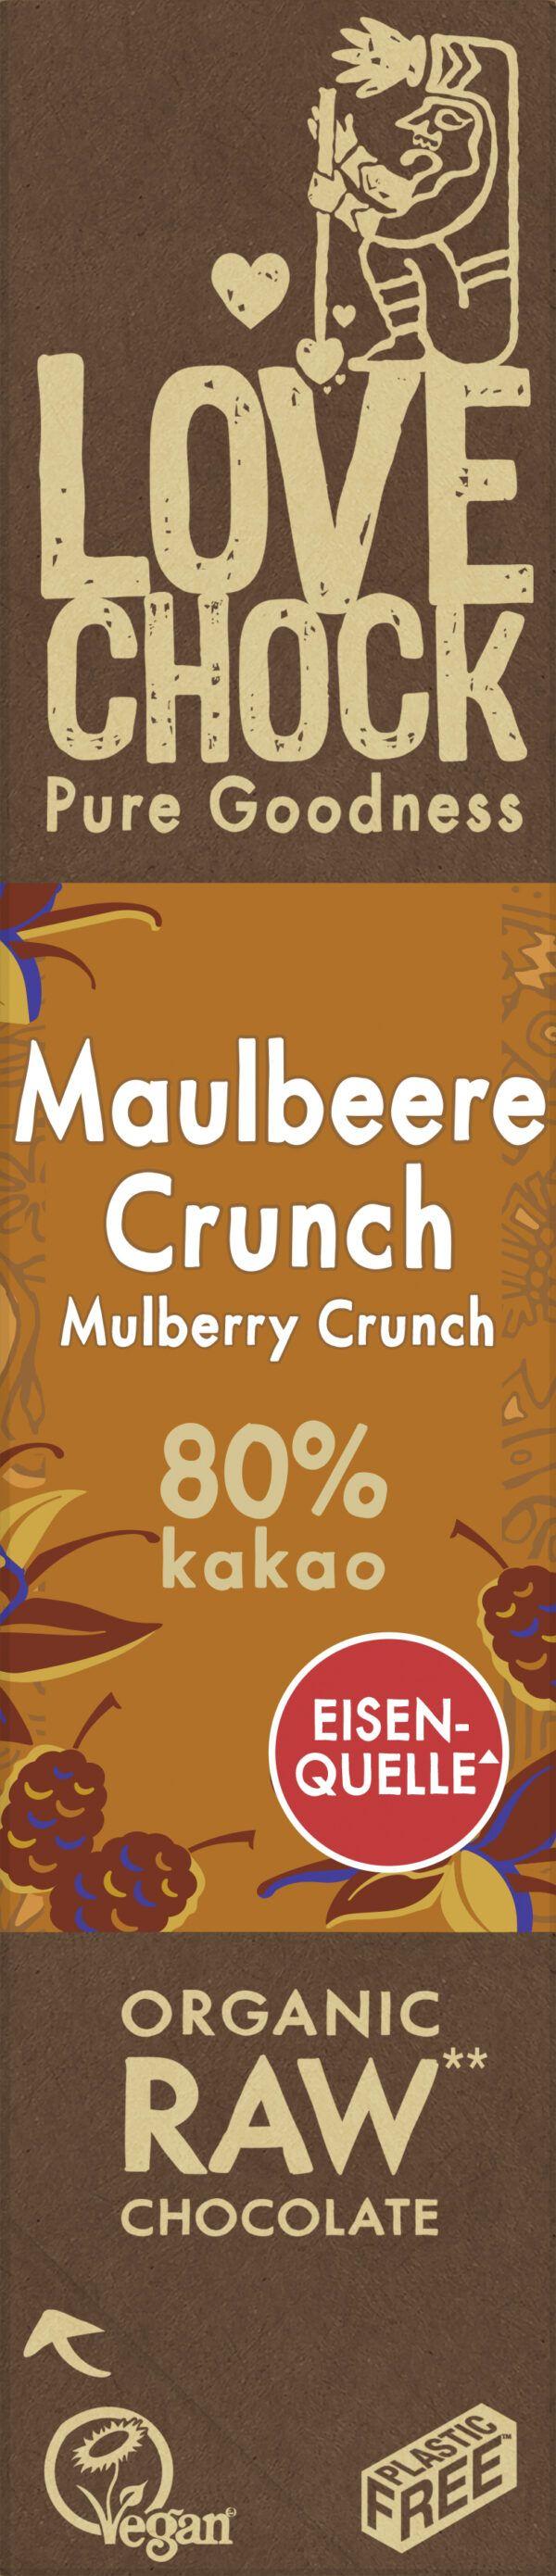 Lovechock B.V. Lovechock Riegel Maulbeere Crunch 80 % 40g